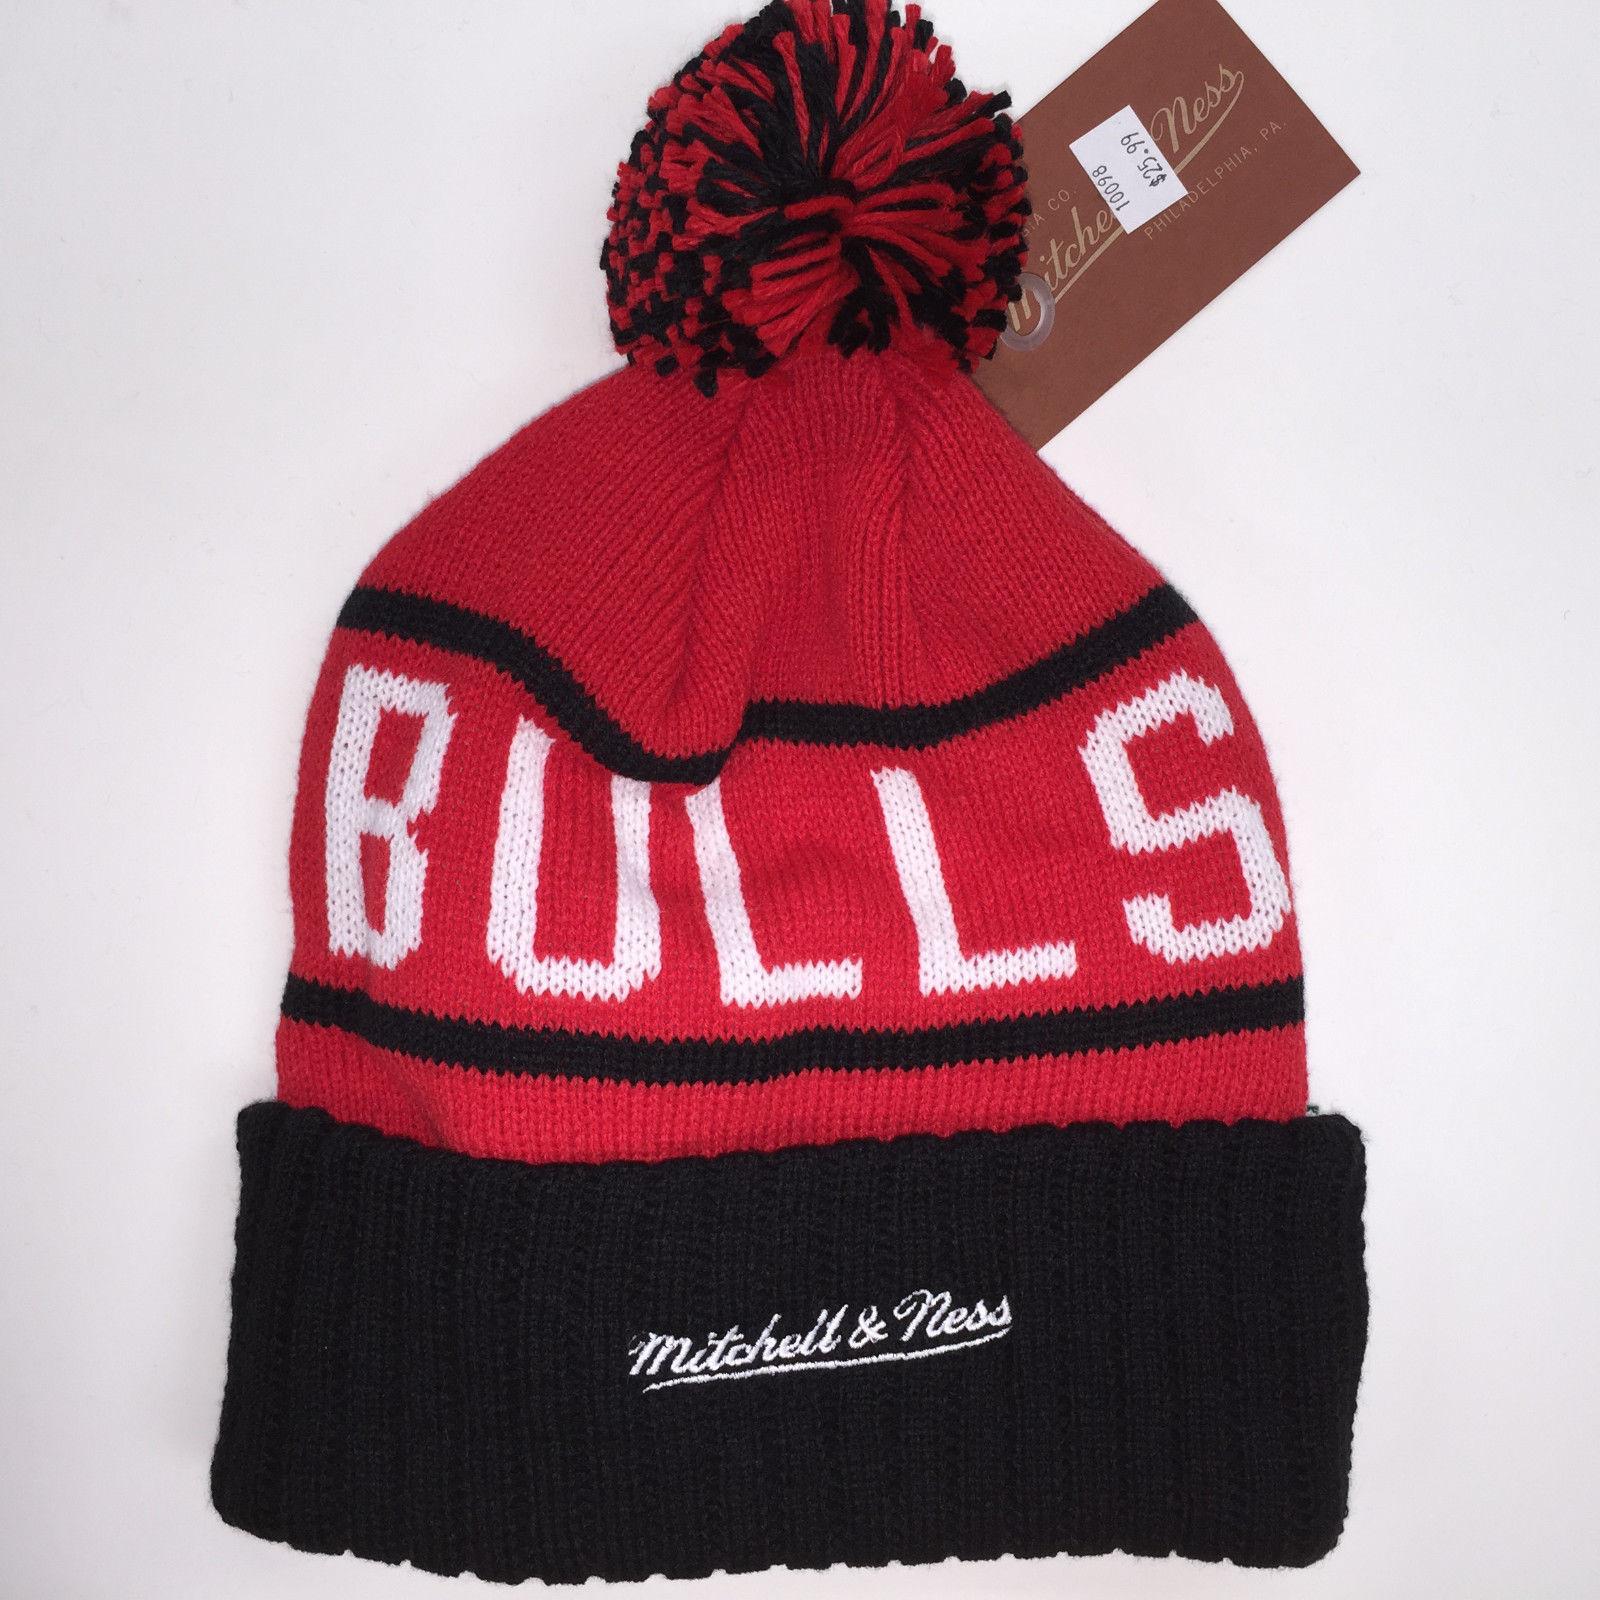 Mitchell & Ness NBA Chicago Bulls High 5 Cuffed Knit Beanie 10098